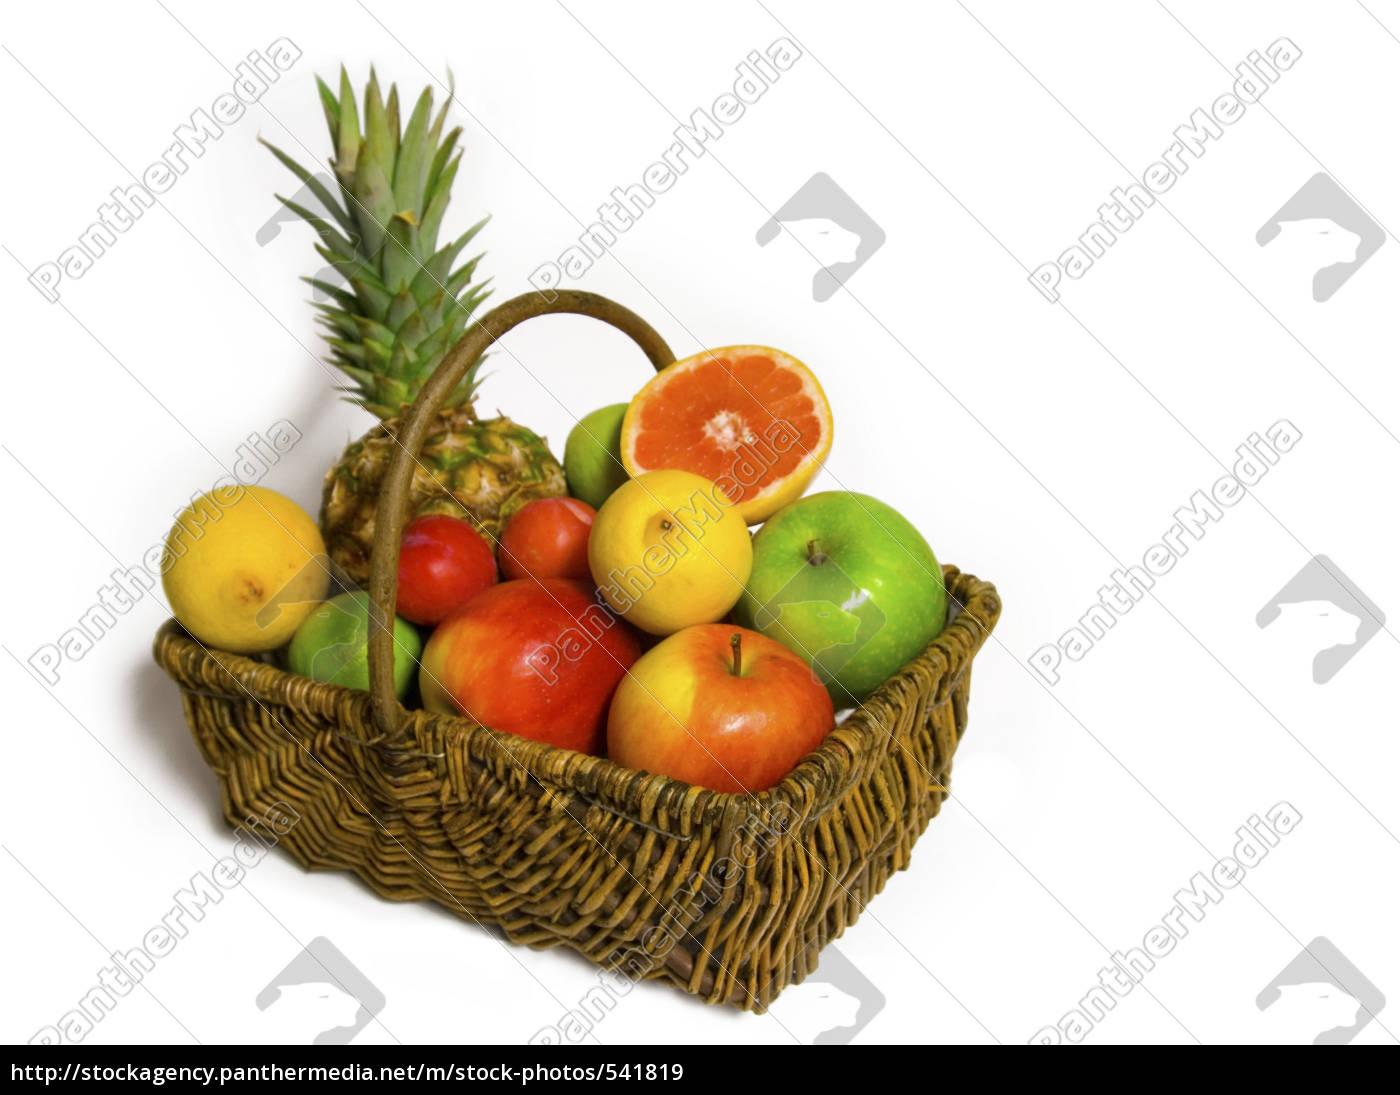 fruit, basket - 541819